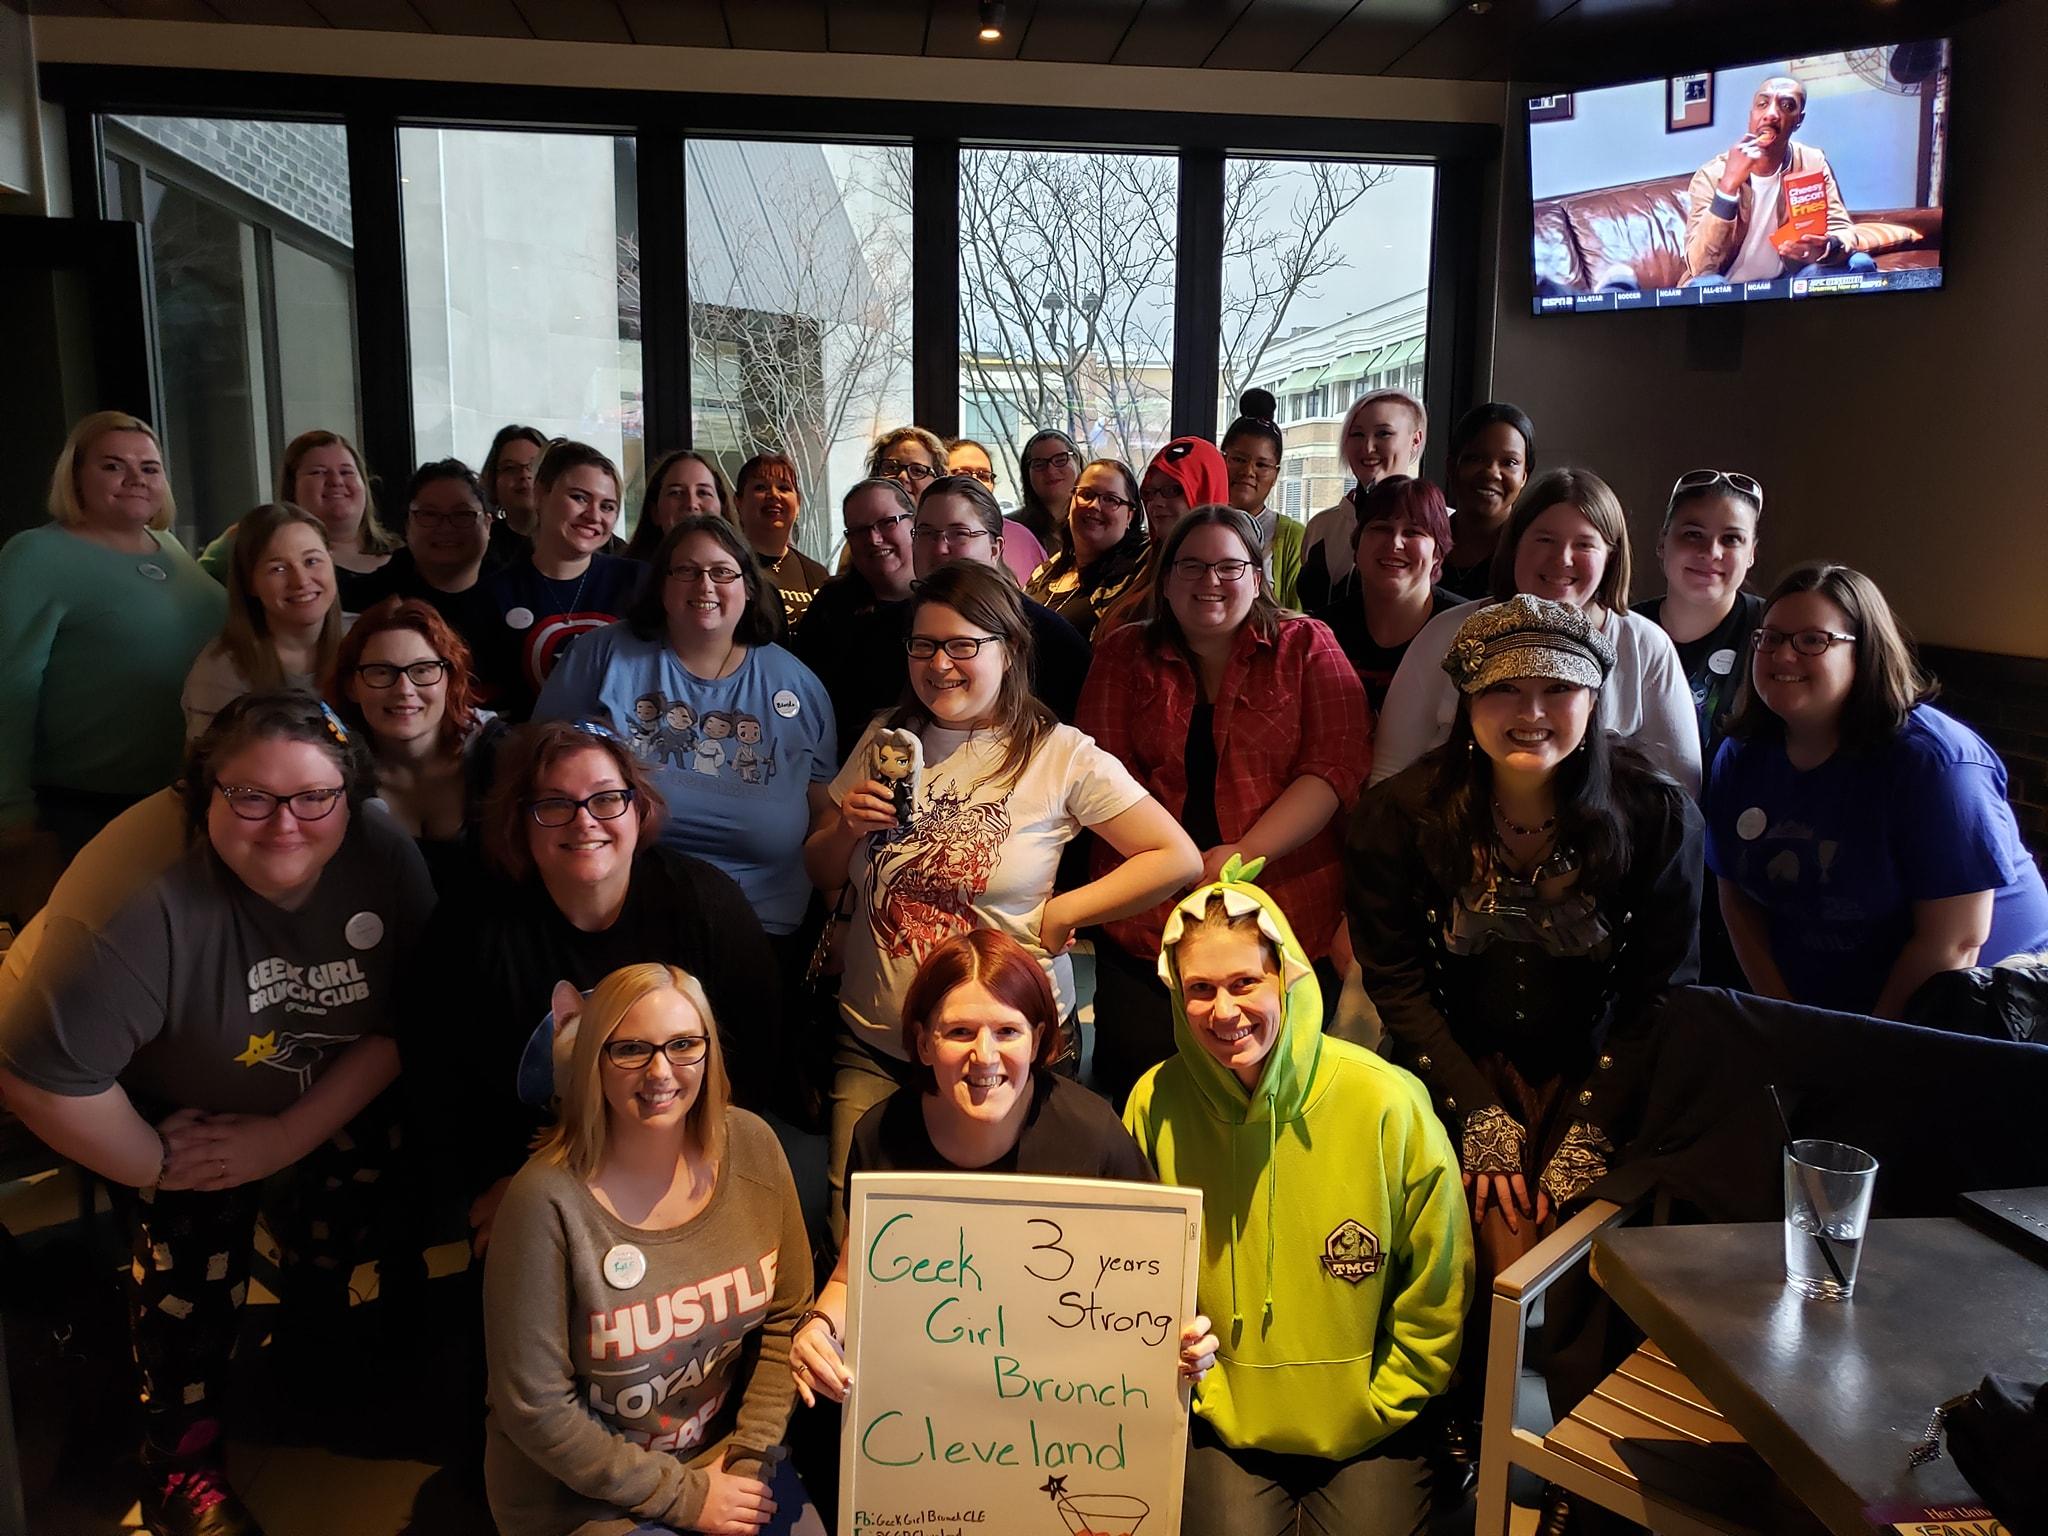 Geek Girl Brunch Cleveland – Celebrate Your Fandom (Our 3rd Anniversary Brunch!)